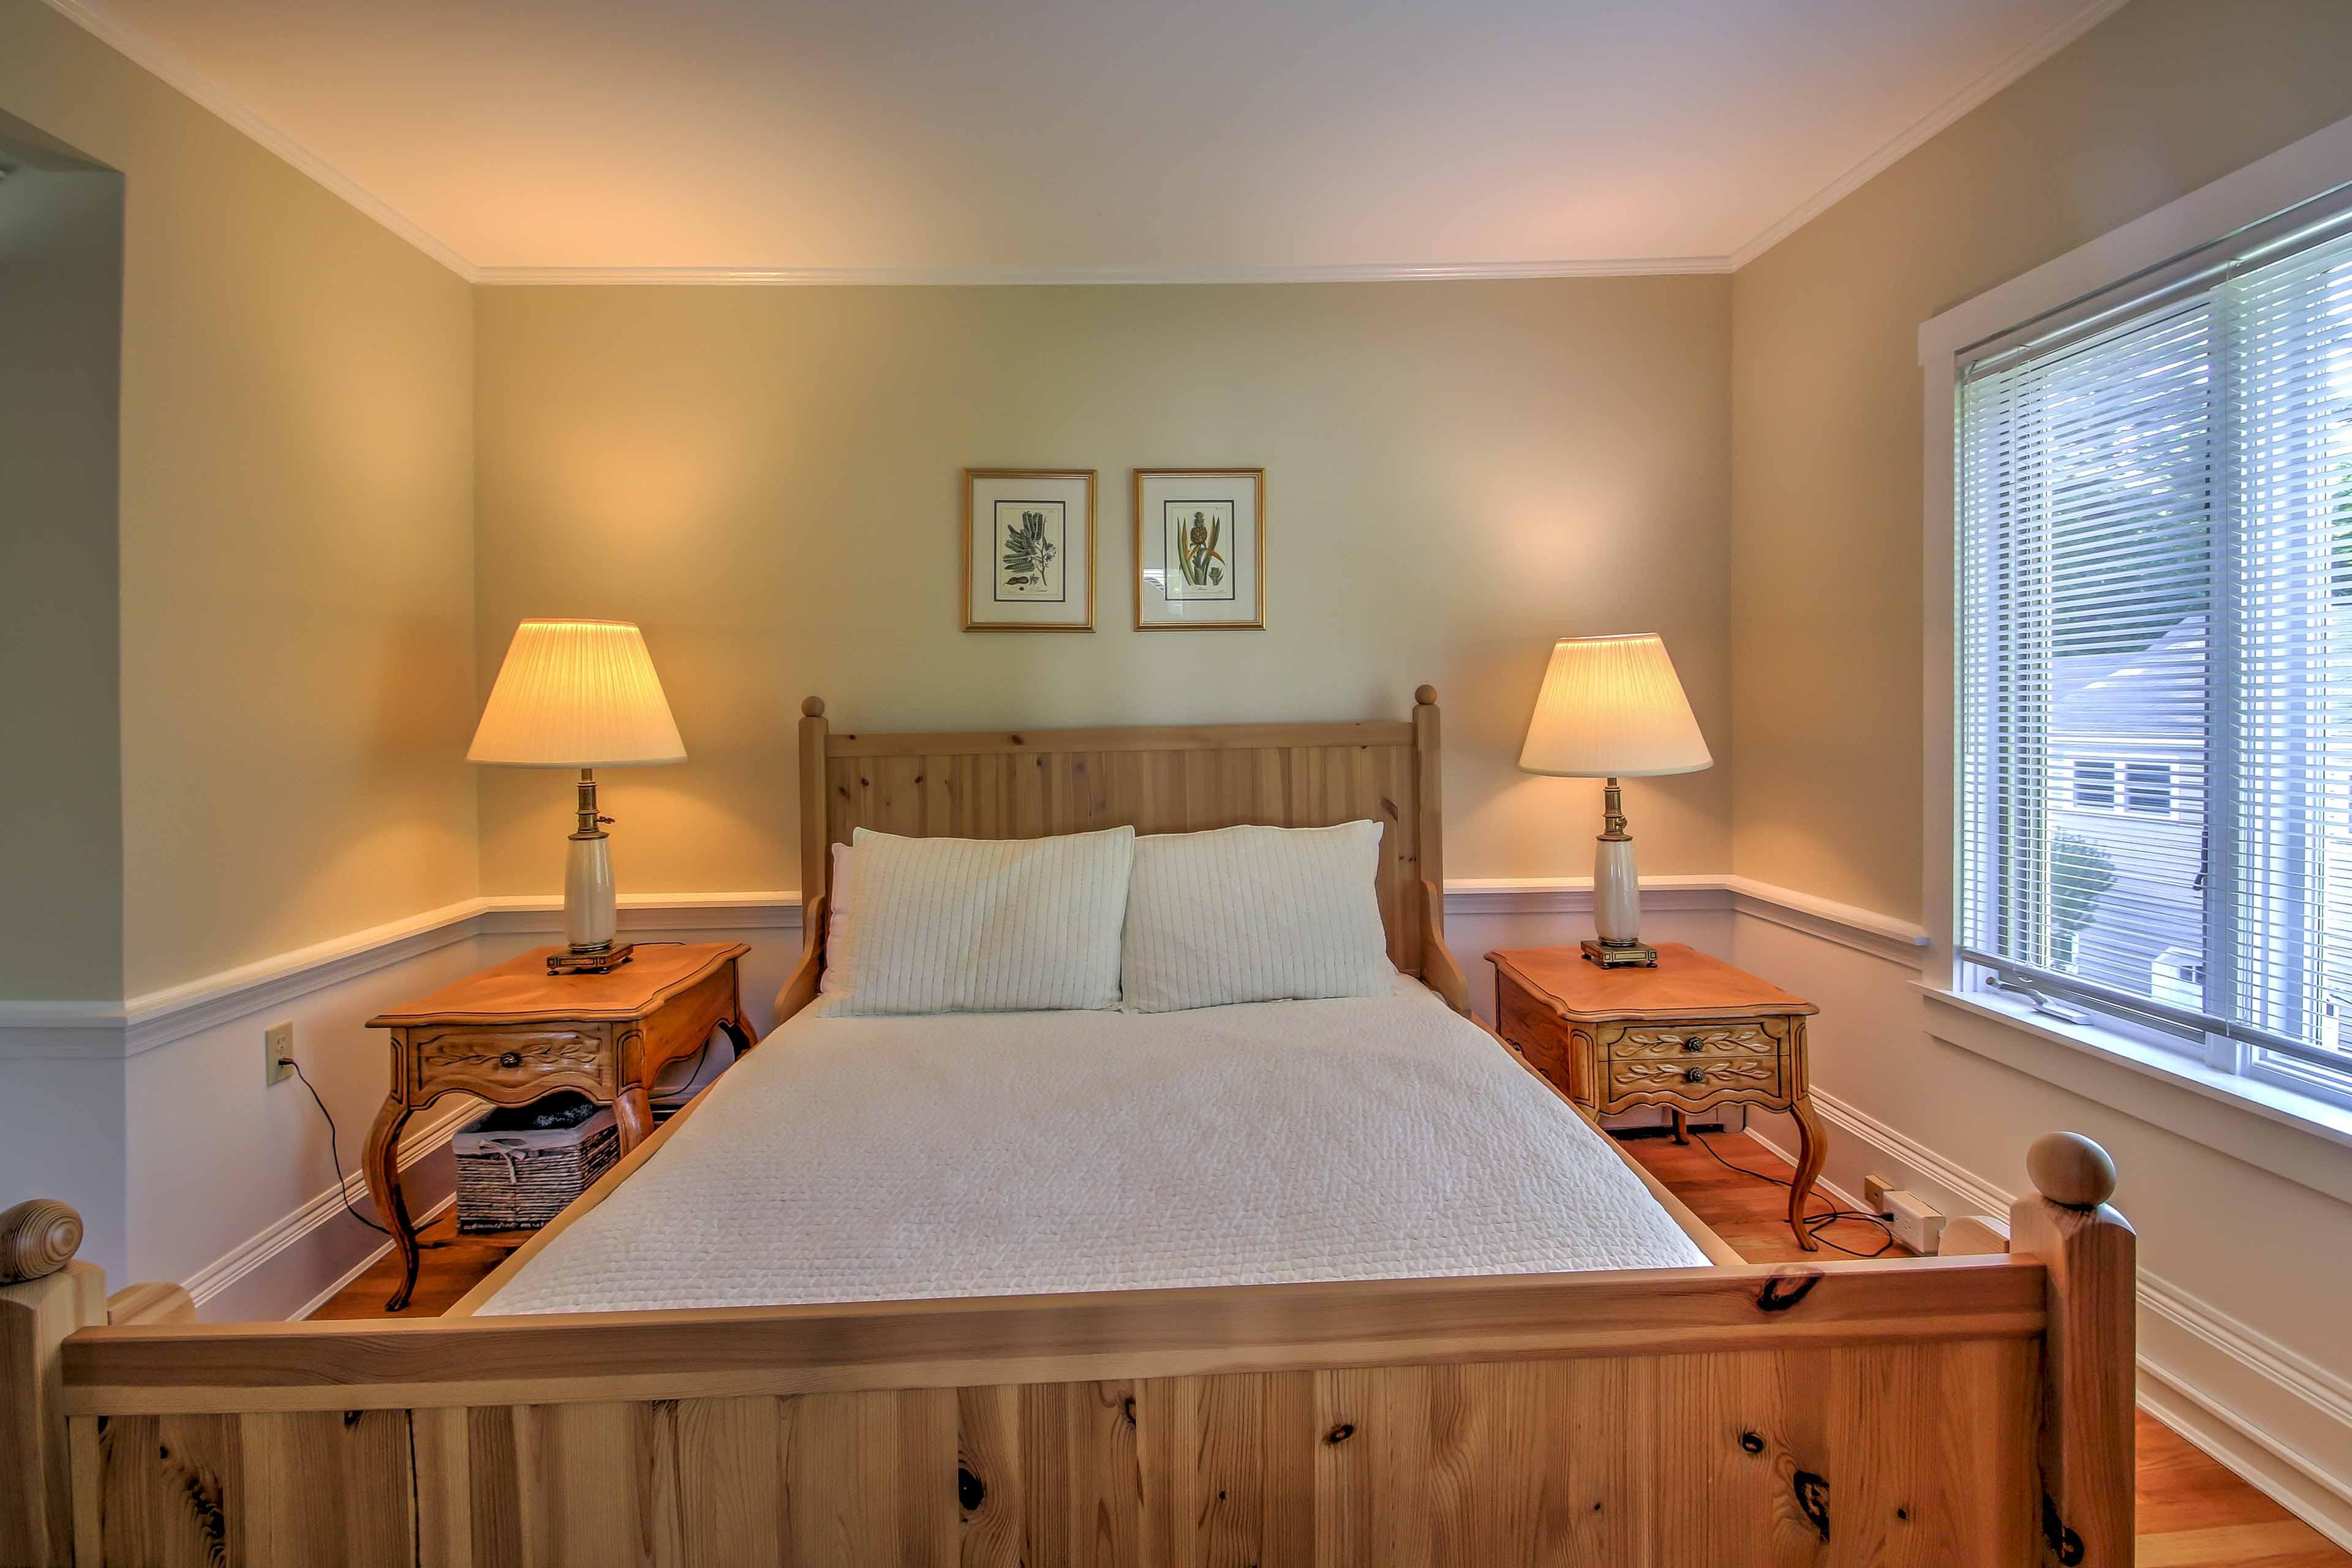 Each bedroom offers plush mattresses, soft linens, and unique, stylish decor.